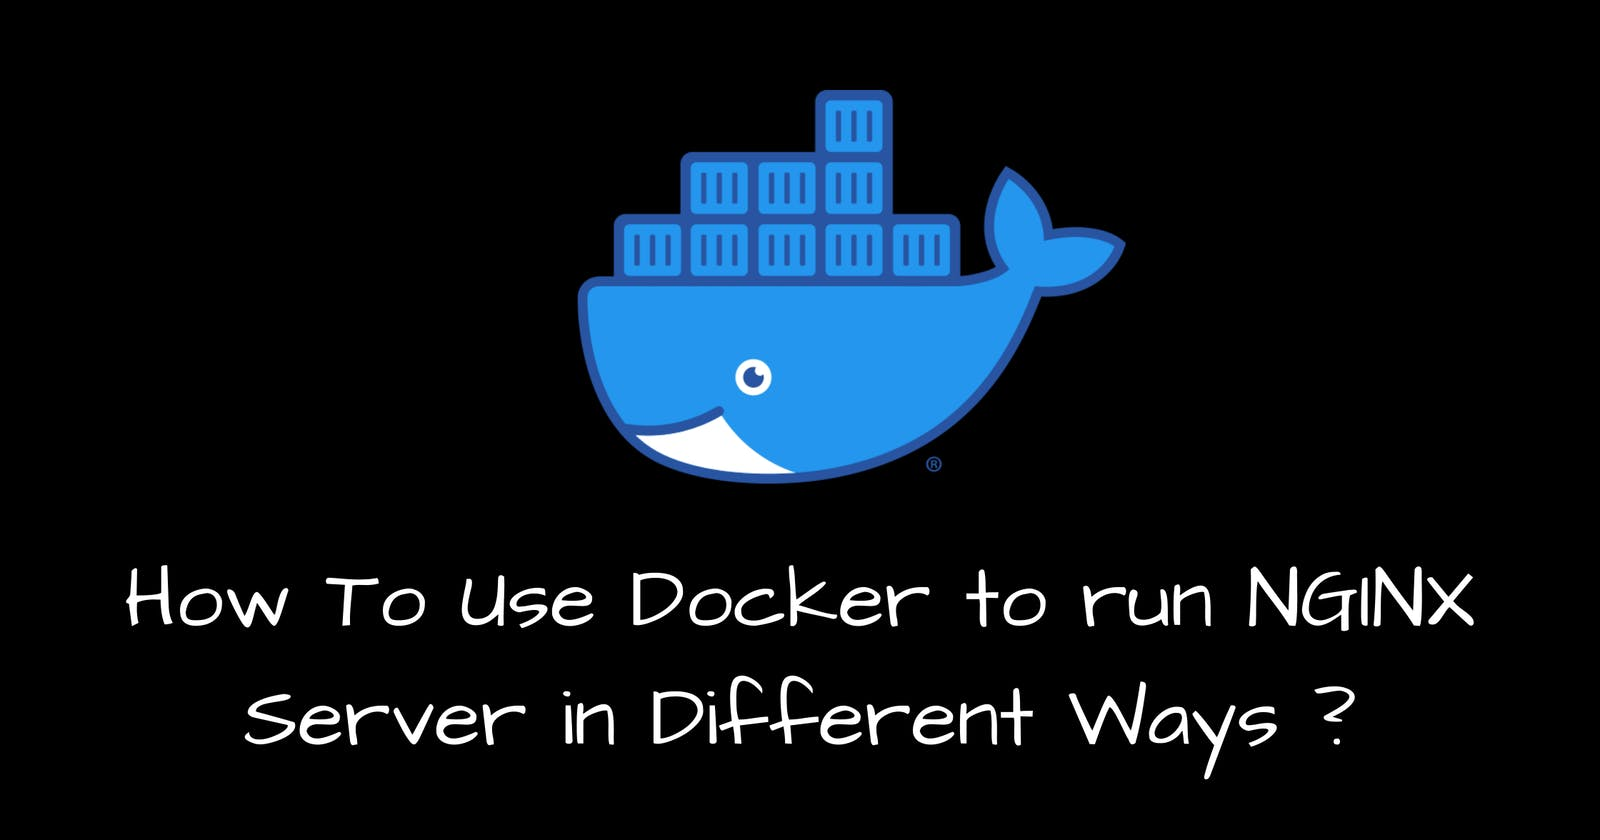 Using Docker to Run Nginx Server in Different Ways